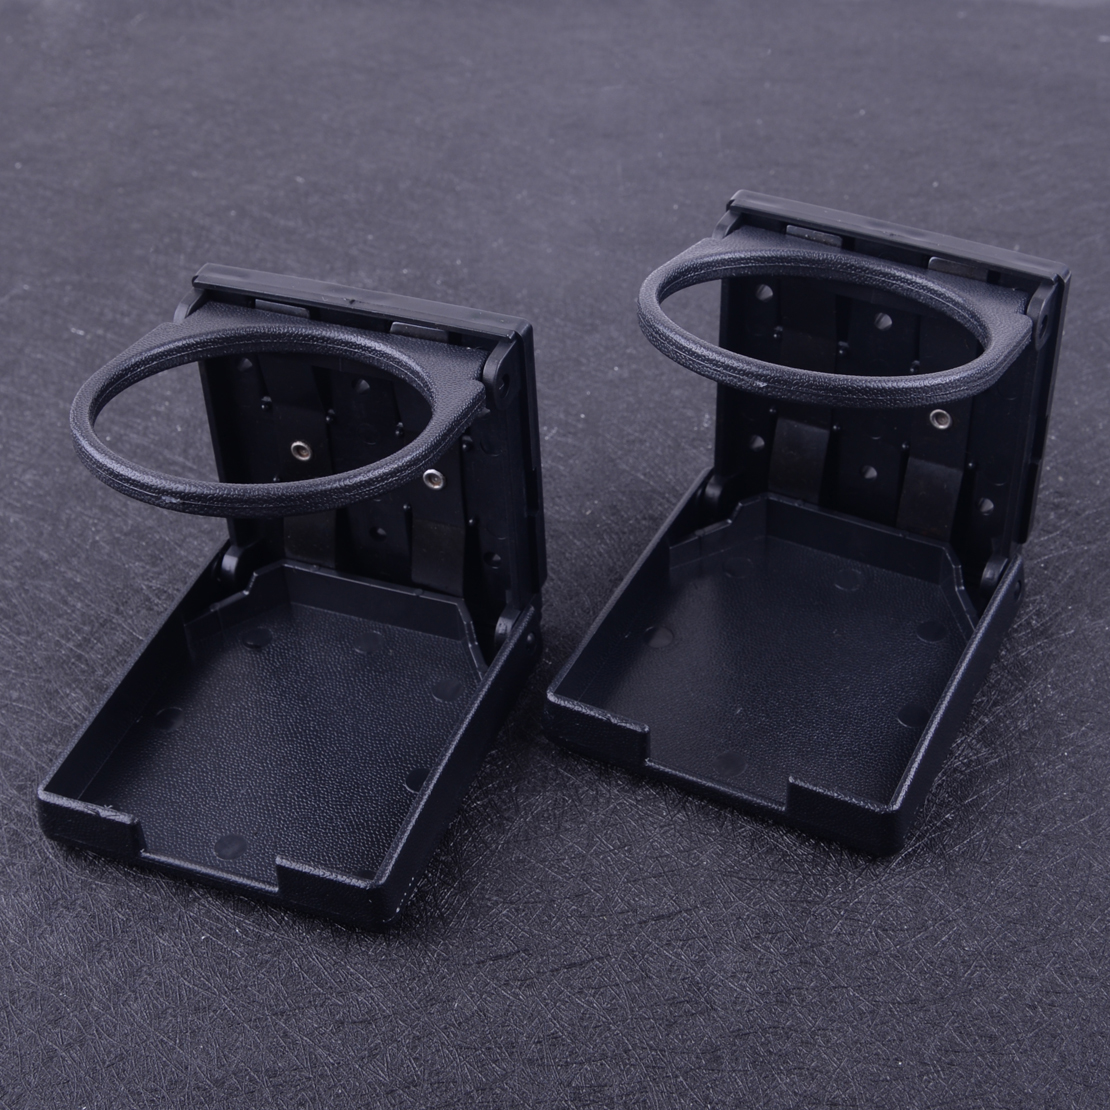 Dwcx 2 pçs preto universal ajustável dobrável